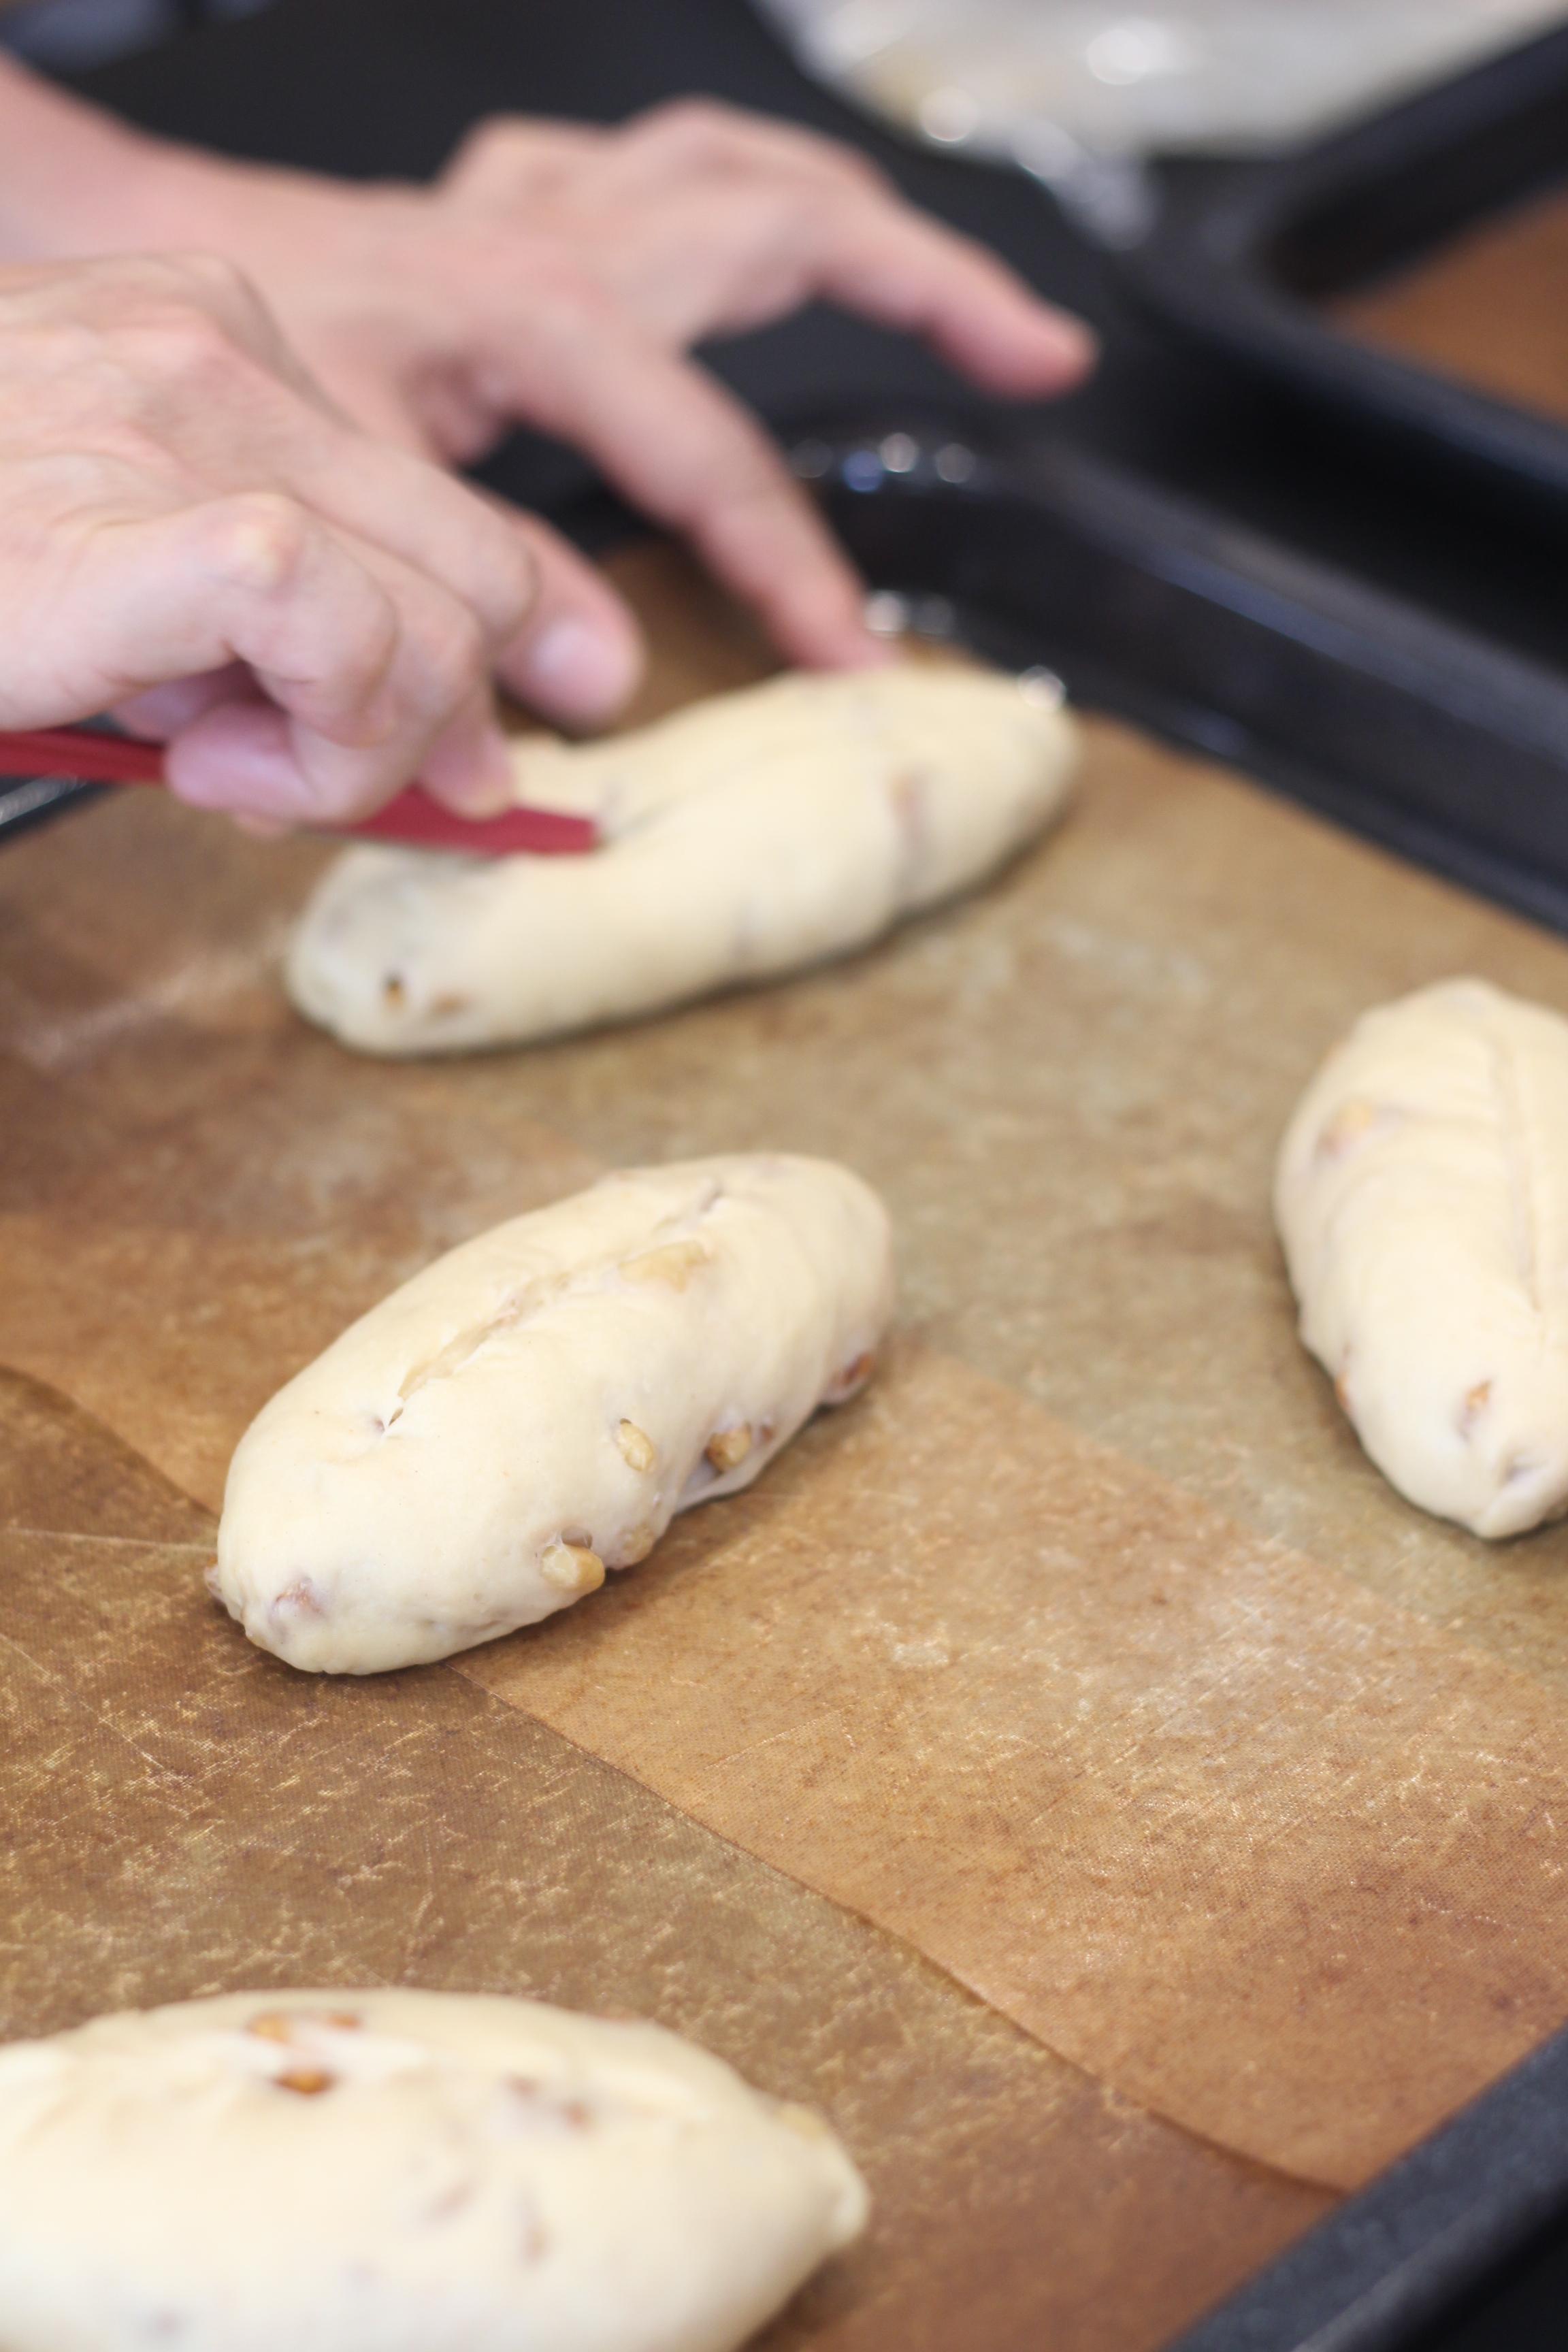 a-ta-sante糖質制限パン料理教室、阿倍野区西田辺。京都江部粉糖質制限パン体験会。